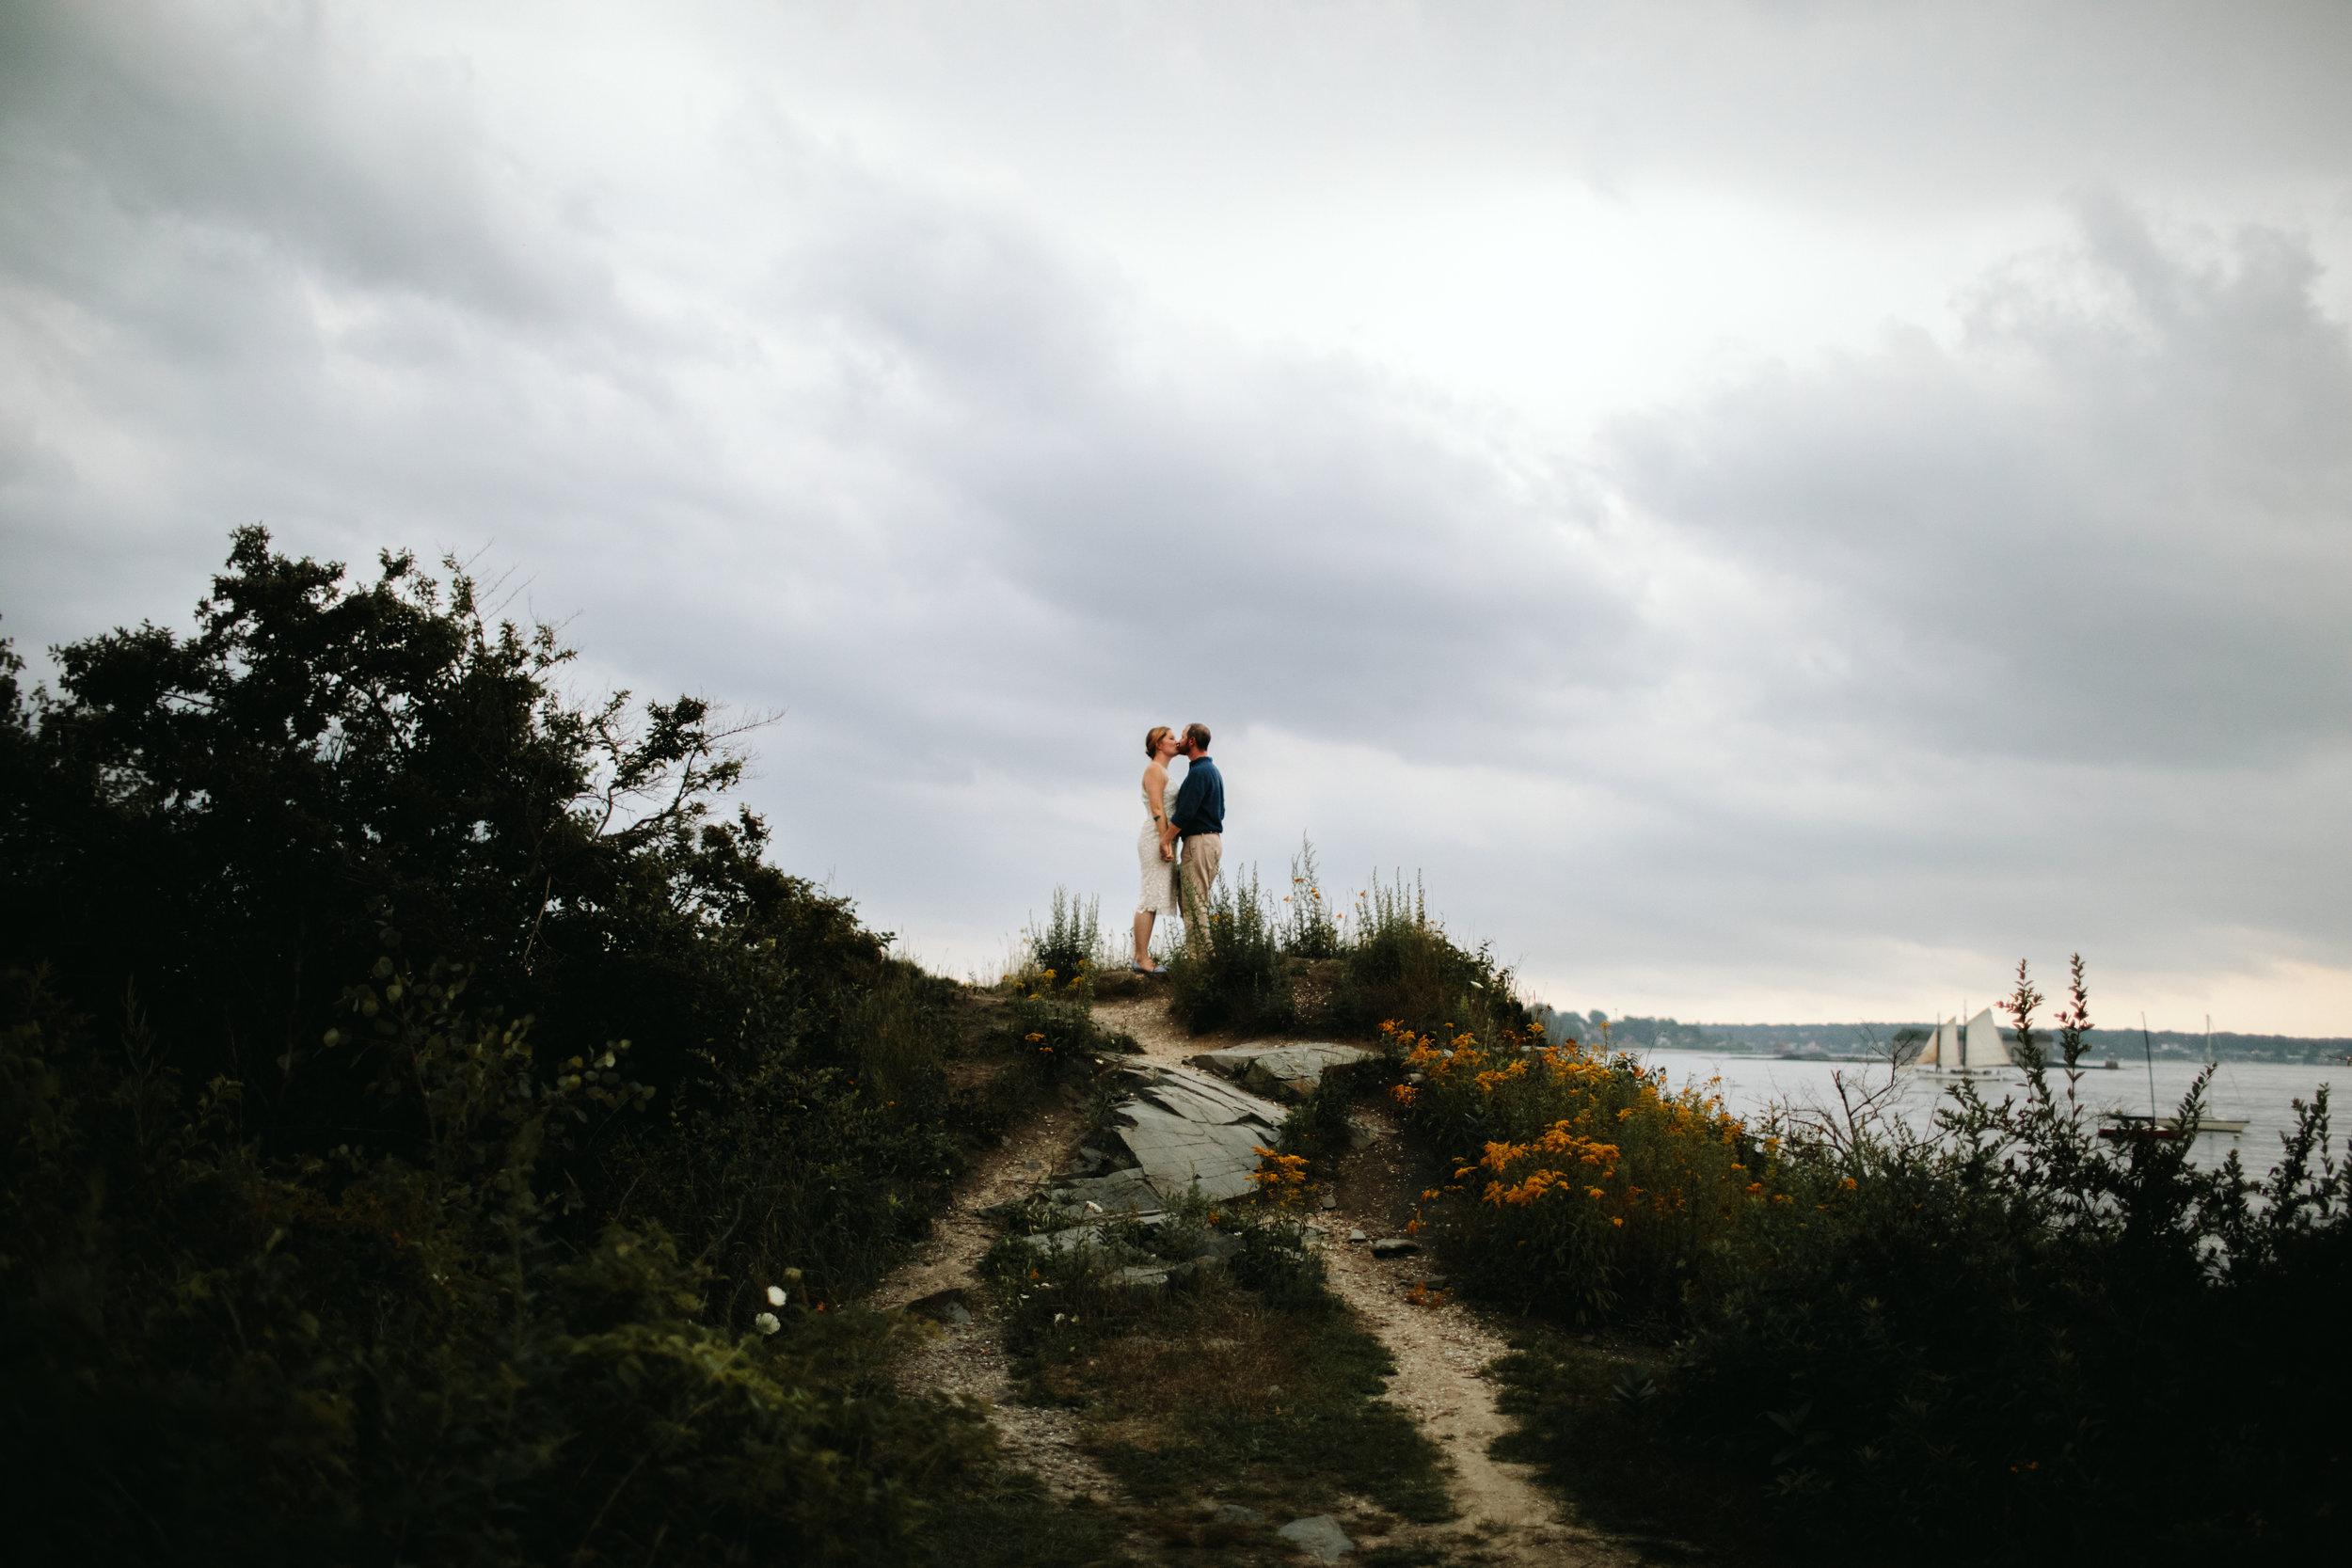 portland-maine-elopement-fort-allen-park-1-2.jpg